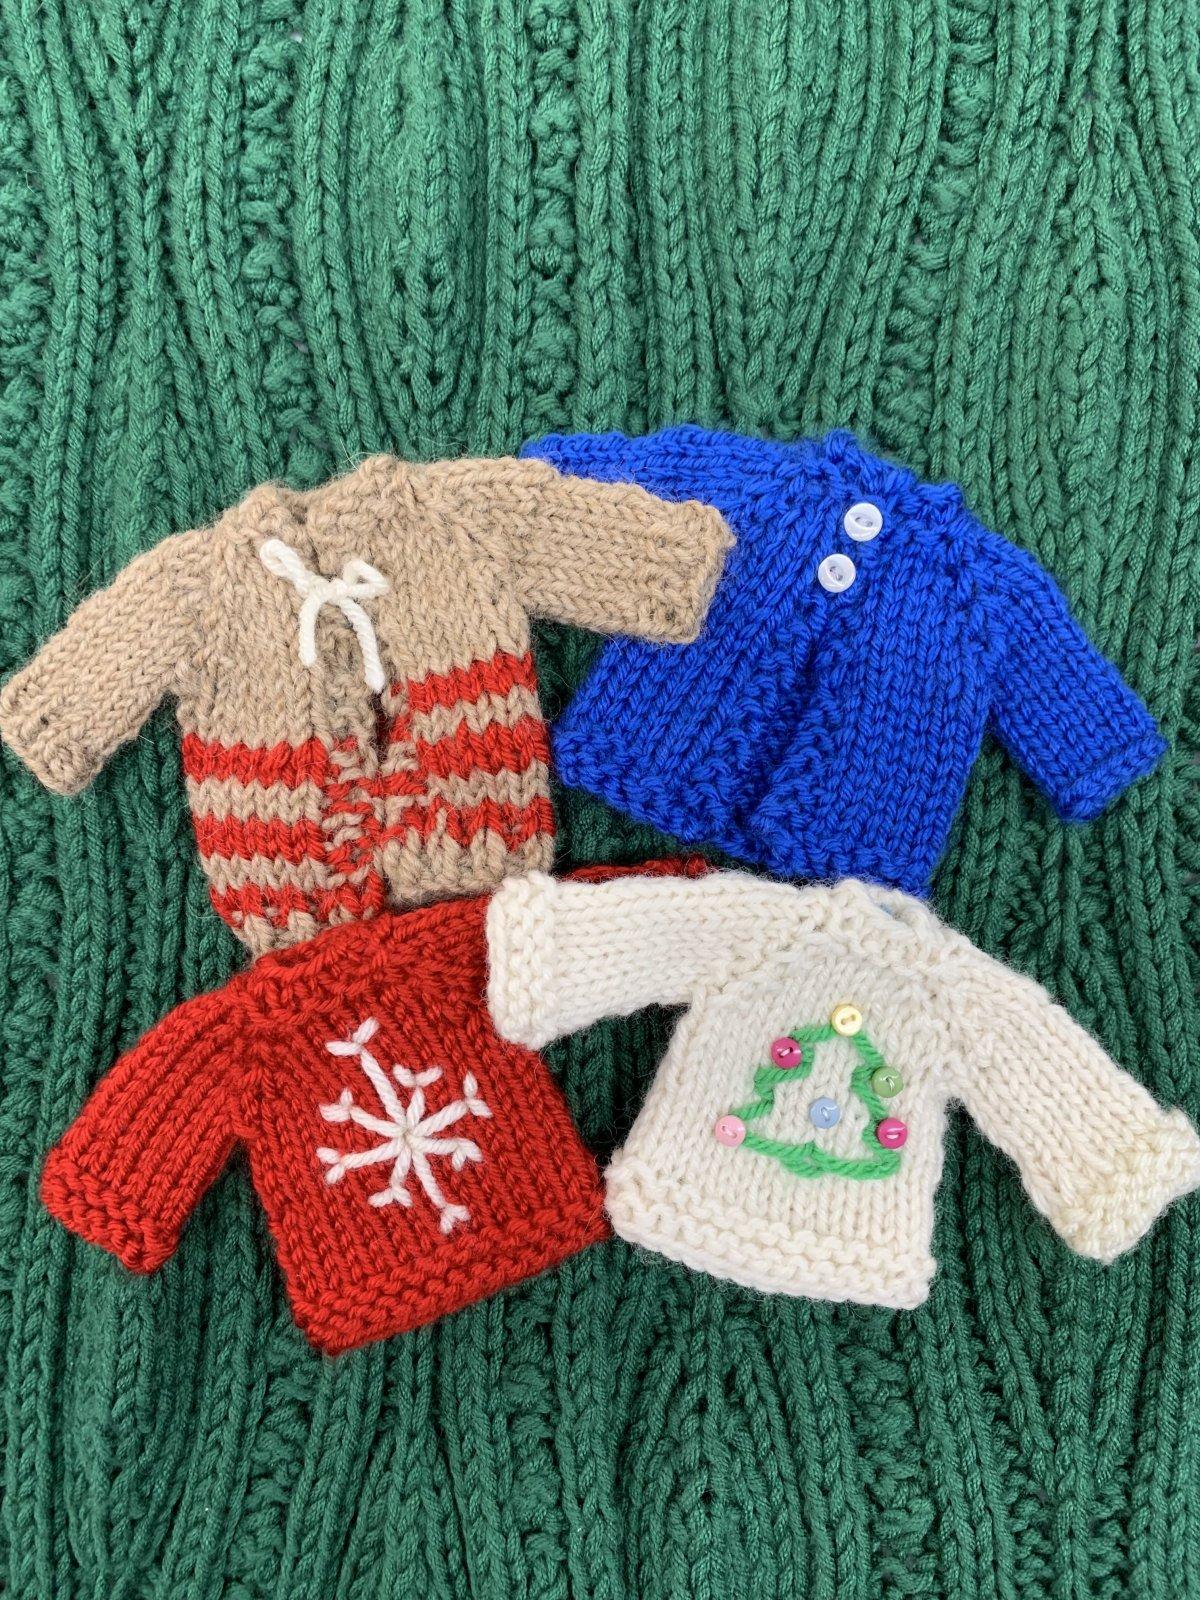 Sweater Ornament Kits Pre-order